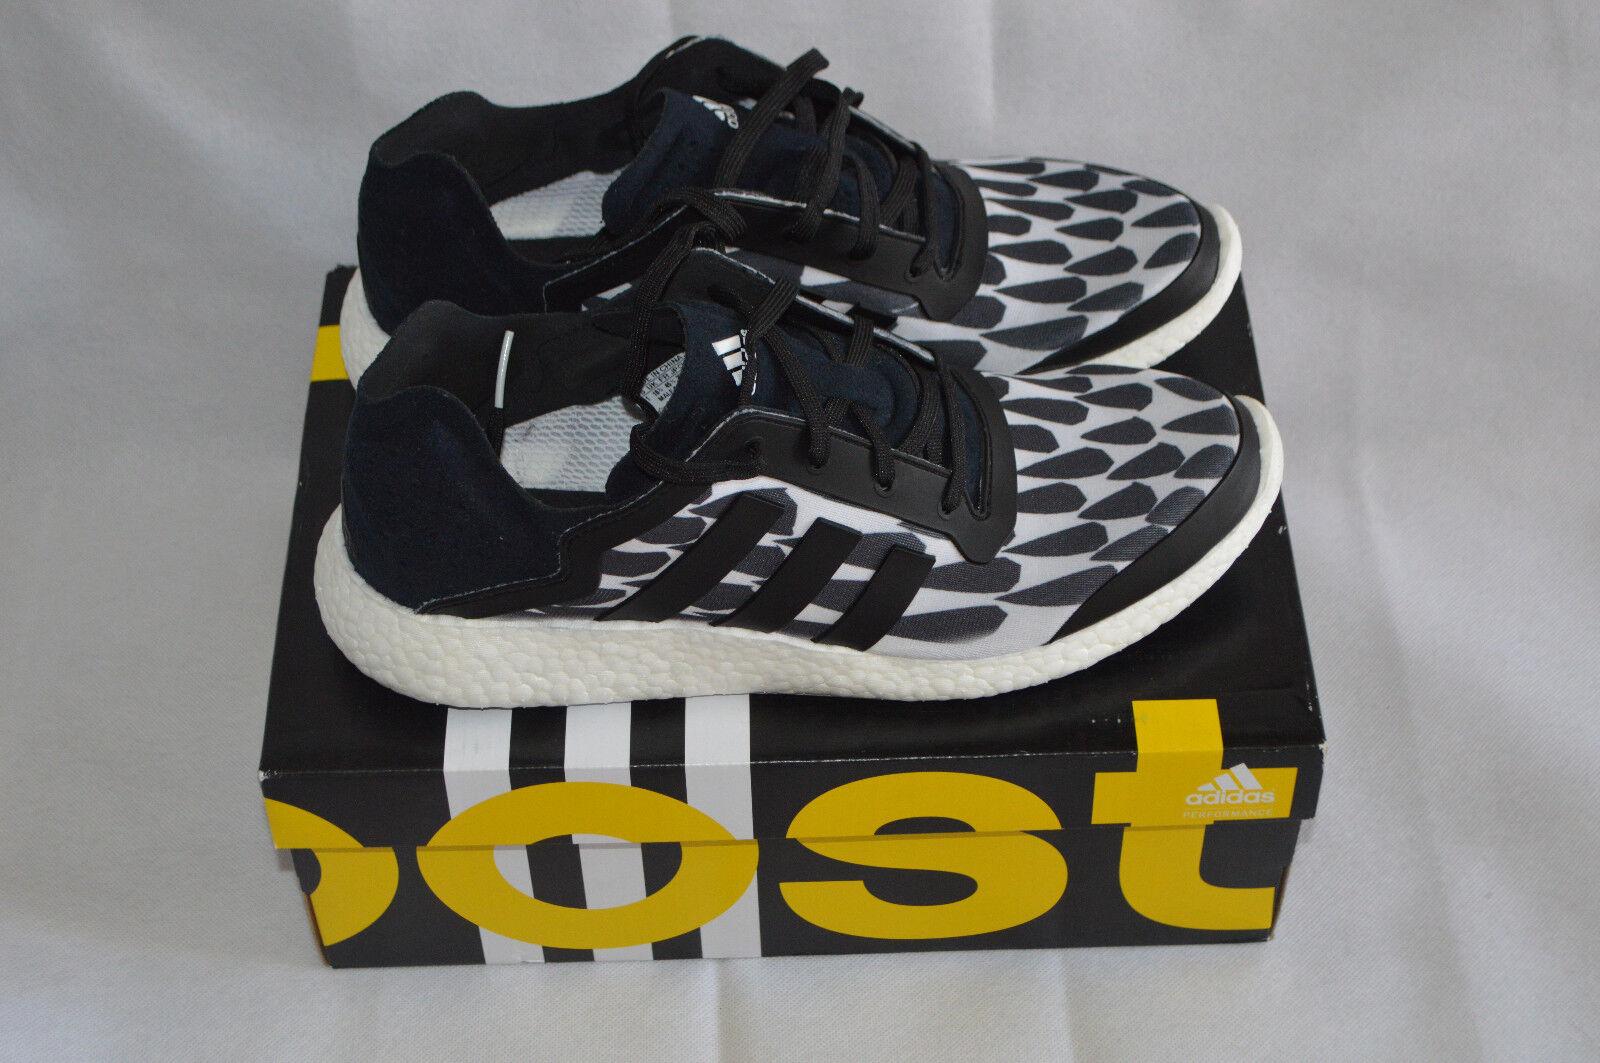 Adidas Men's Pureboost Battle Pack Brazil White/Black Trainers M21891 Size 10.5